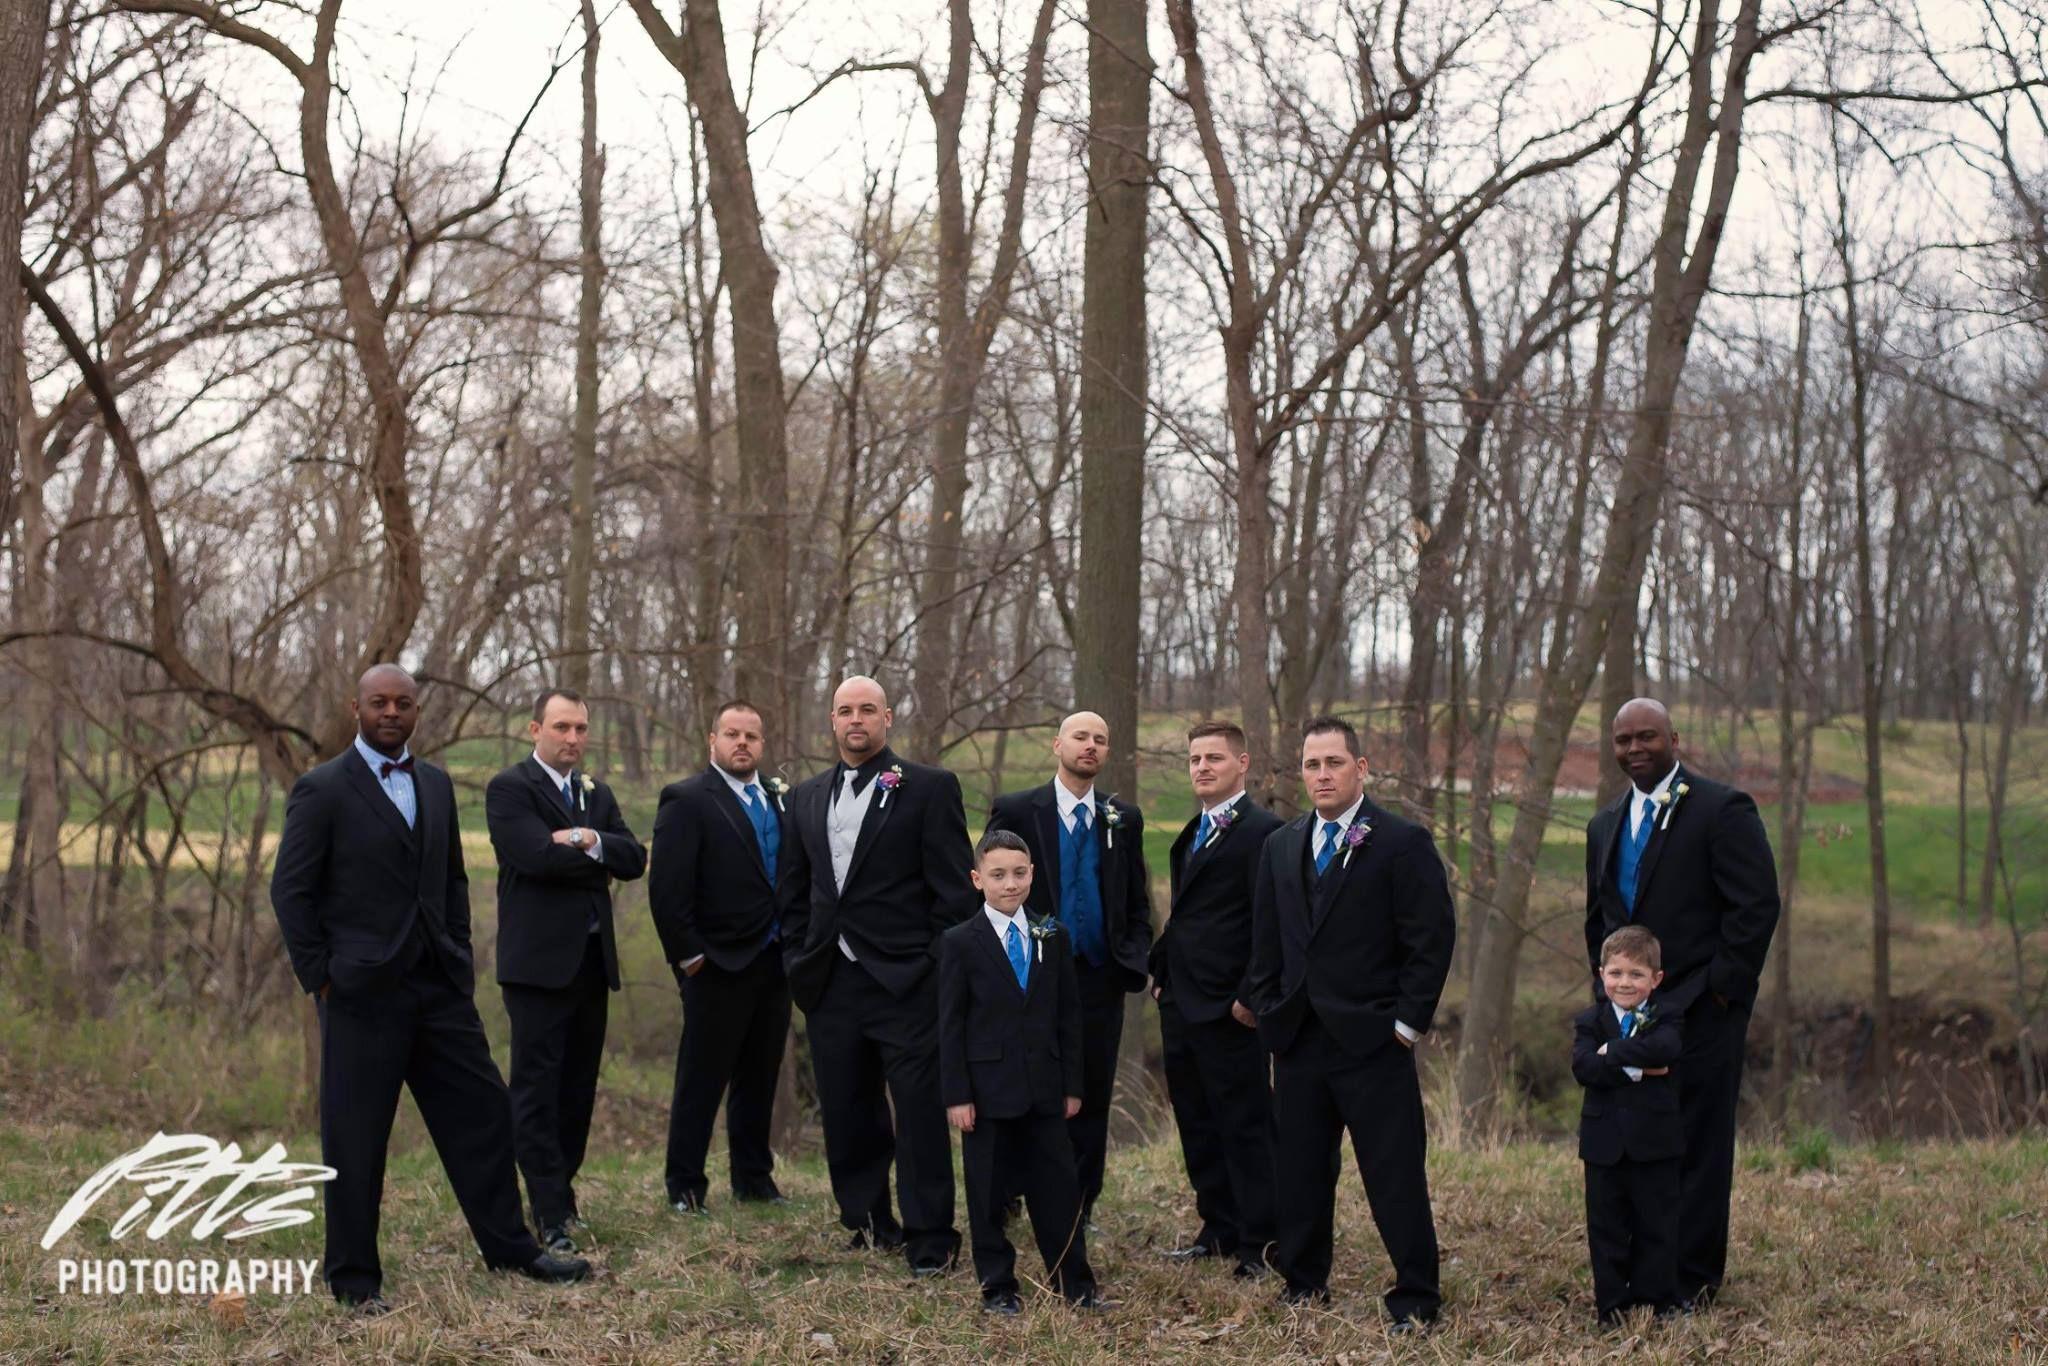 groomsmen posing on wedding day by pitts photographer baldwin city